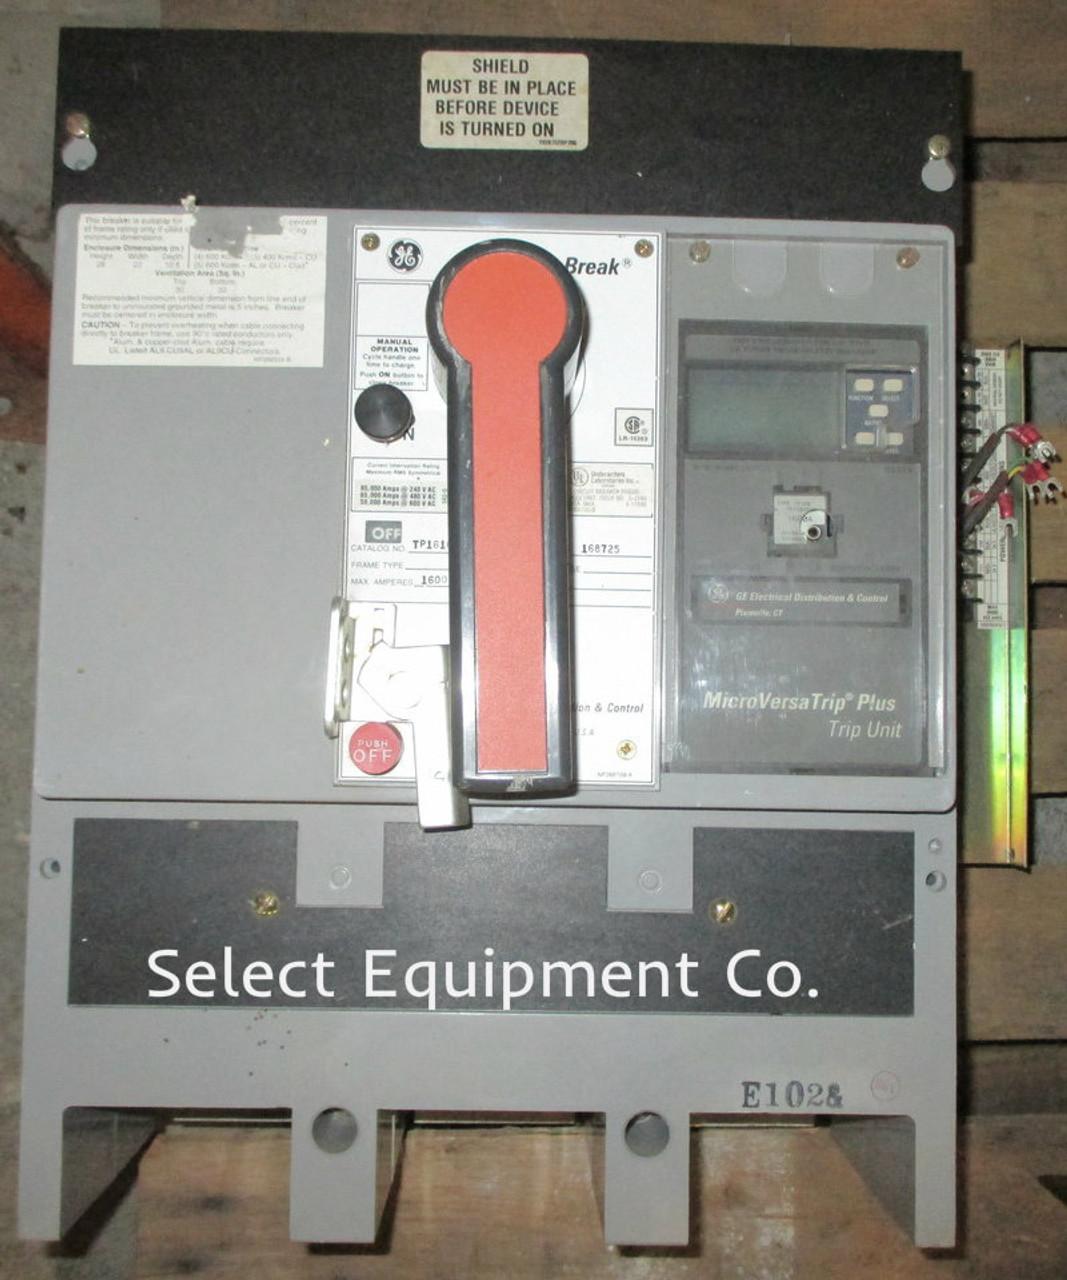 Ge 480v Control Schematic Diagram. Lg Refrigerator Diagrams ... Ge Schematic Diagrampsi Ngmcbb on